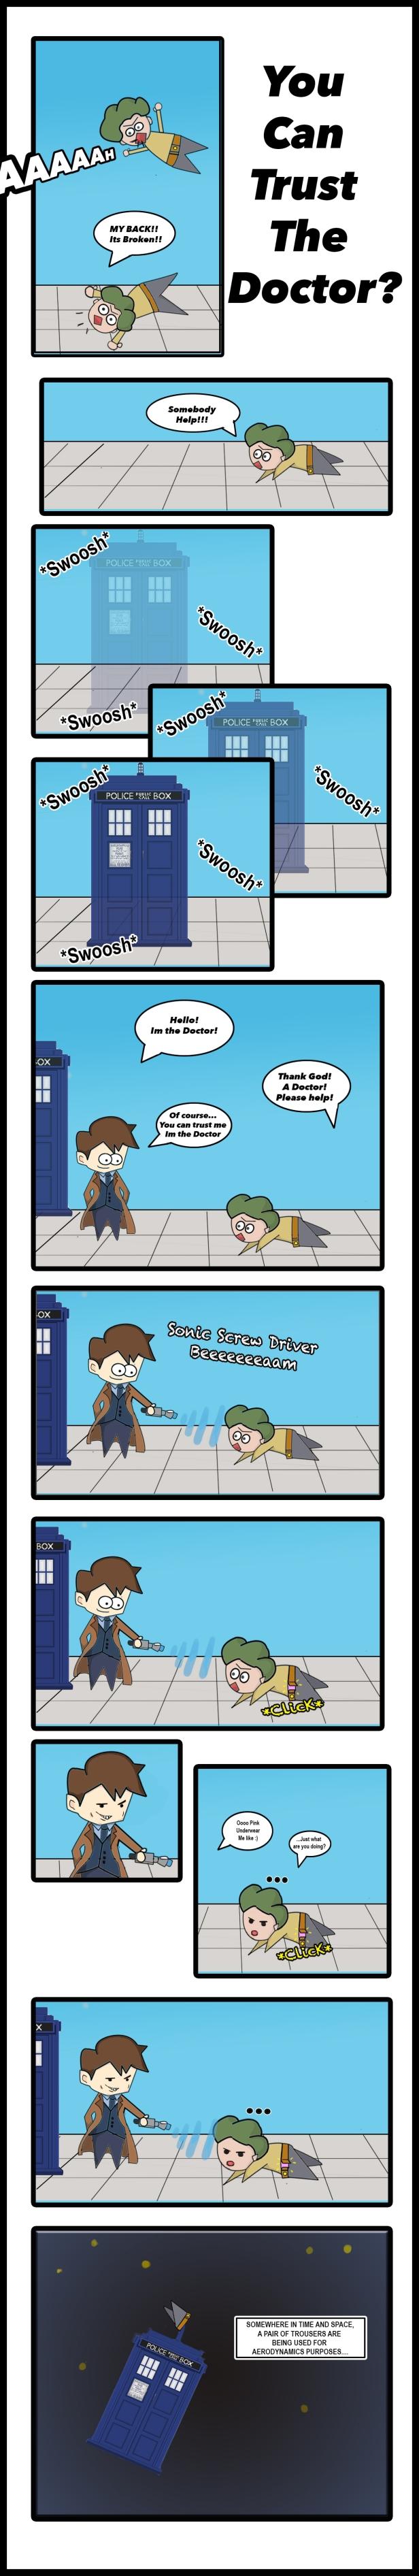 Doctor who Xmas 2015.jpg